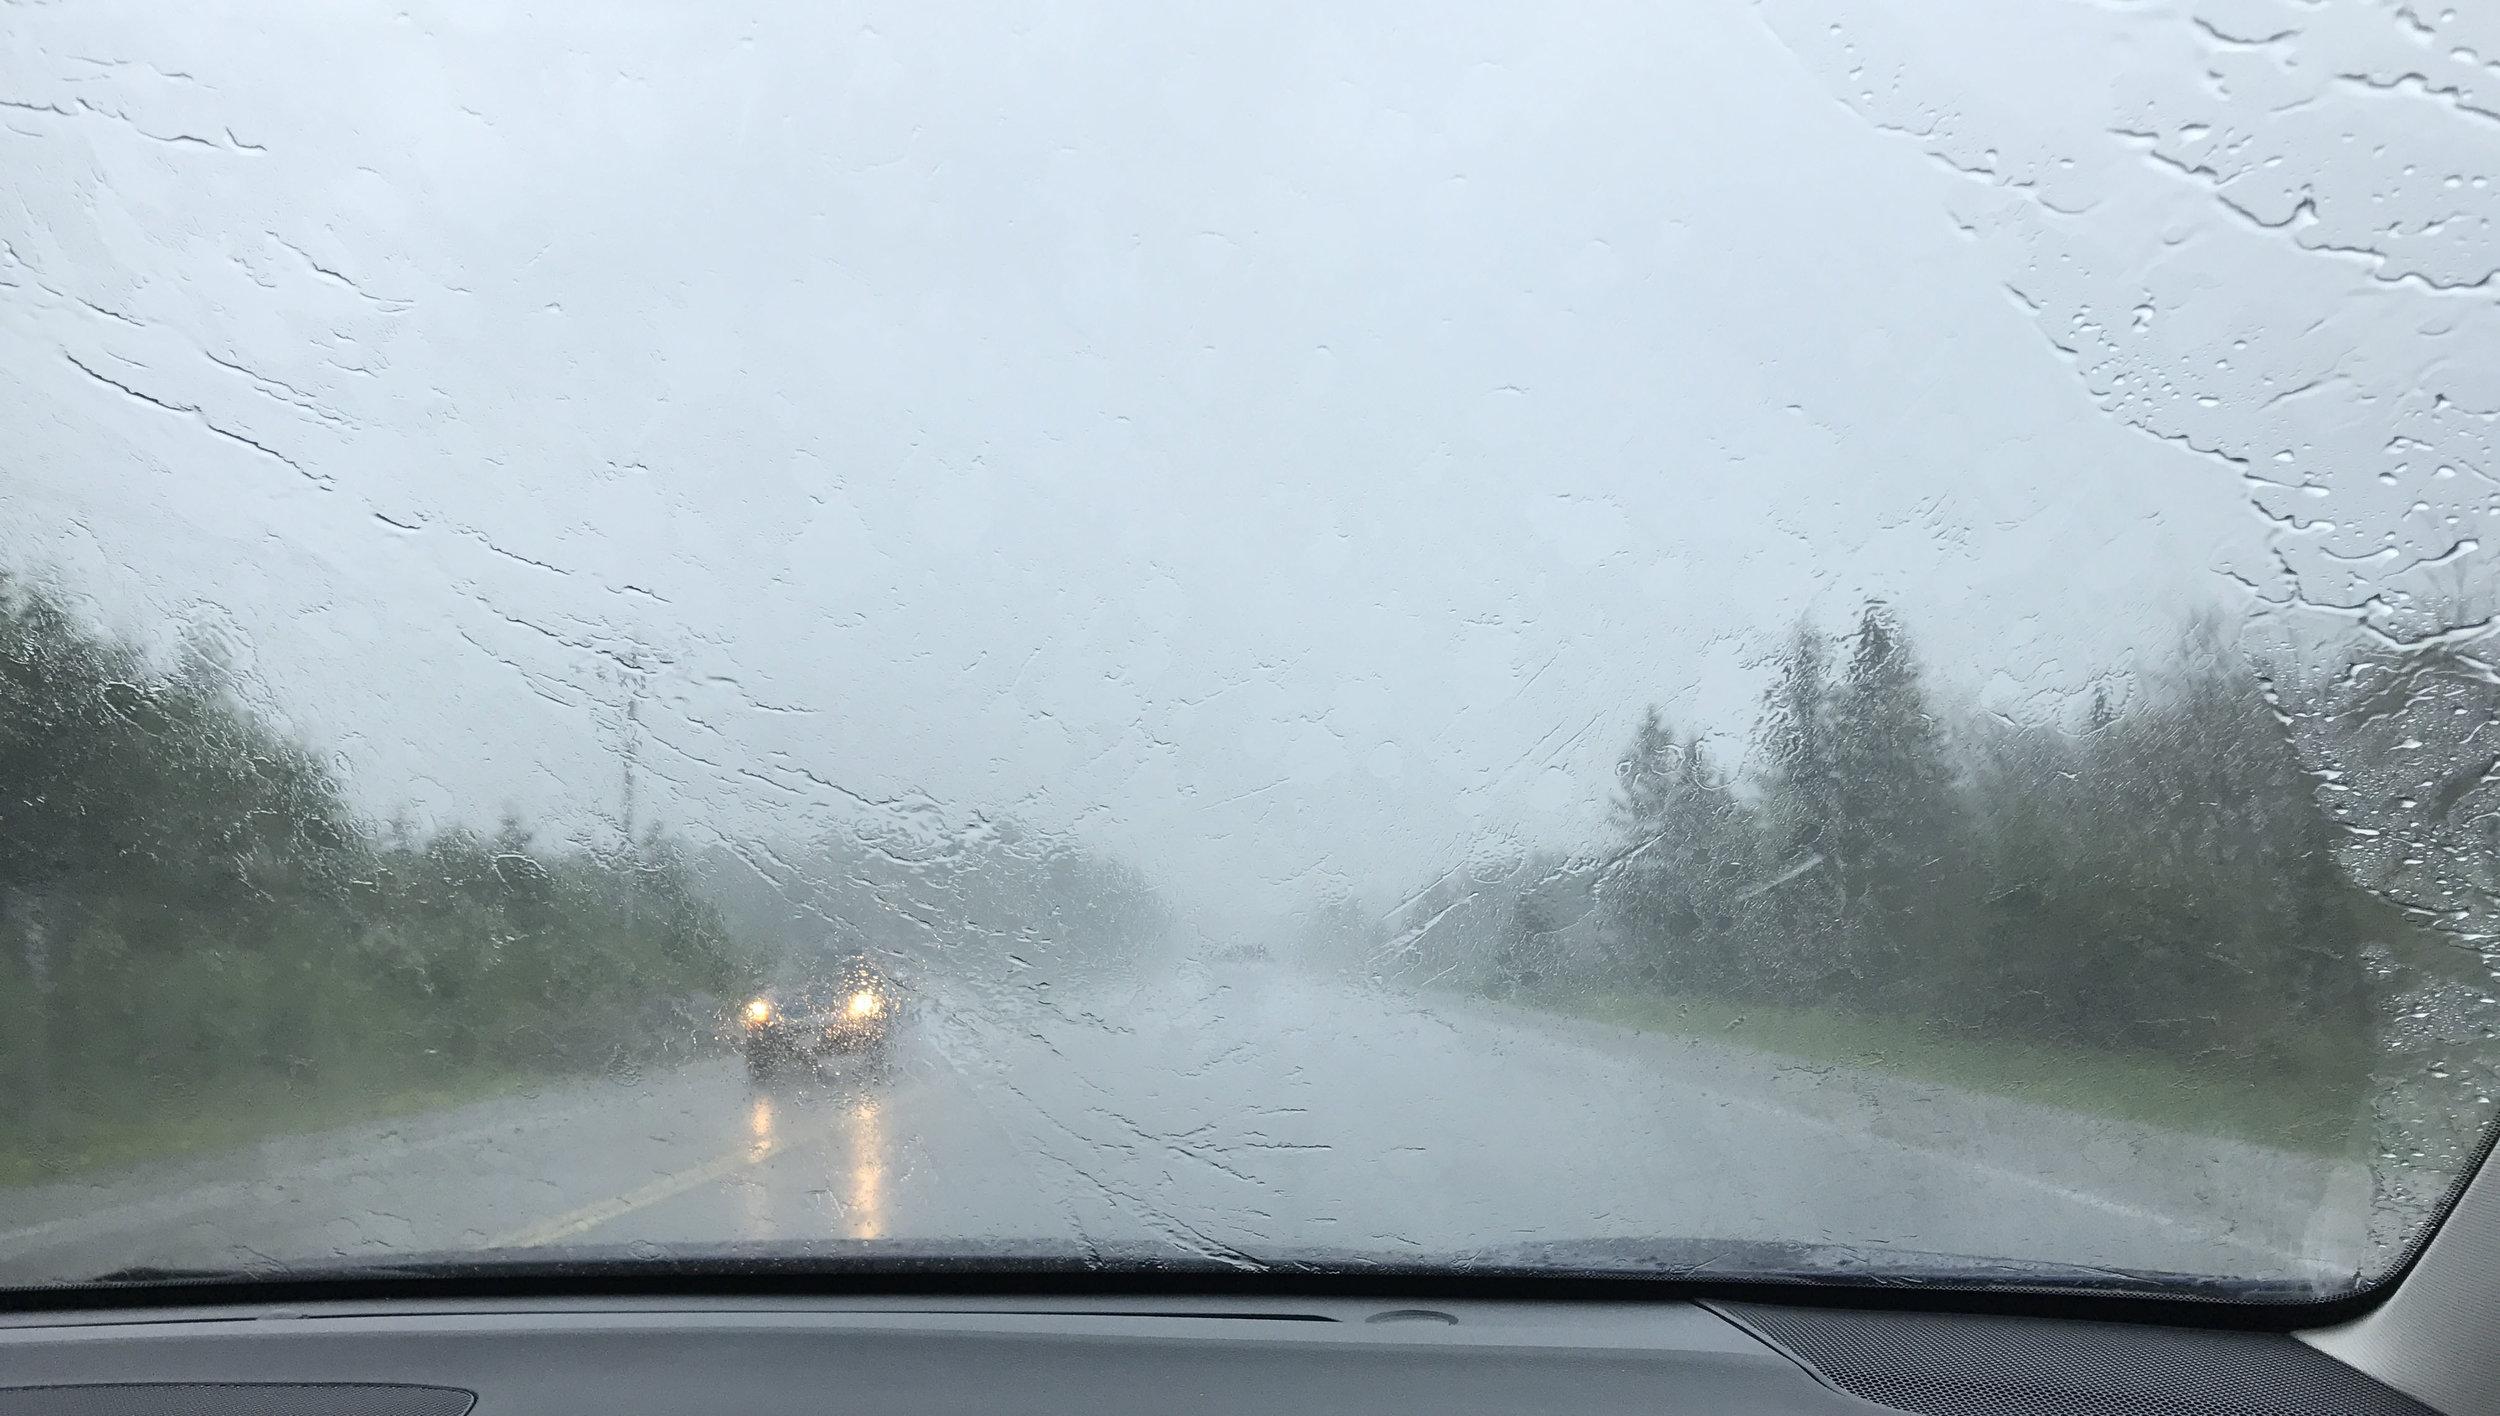 A bit of rain.